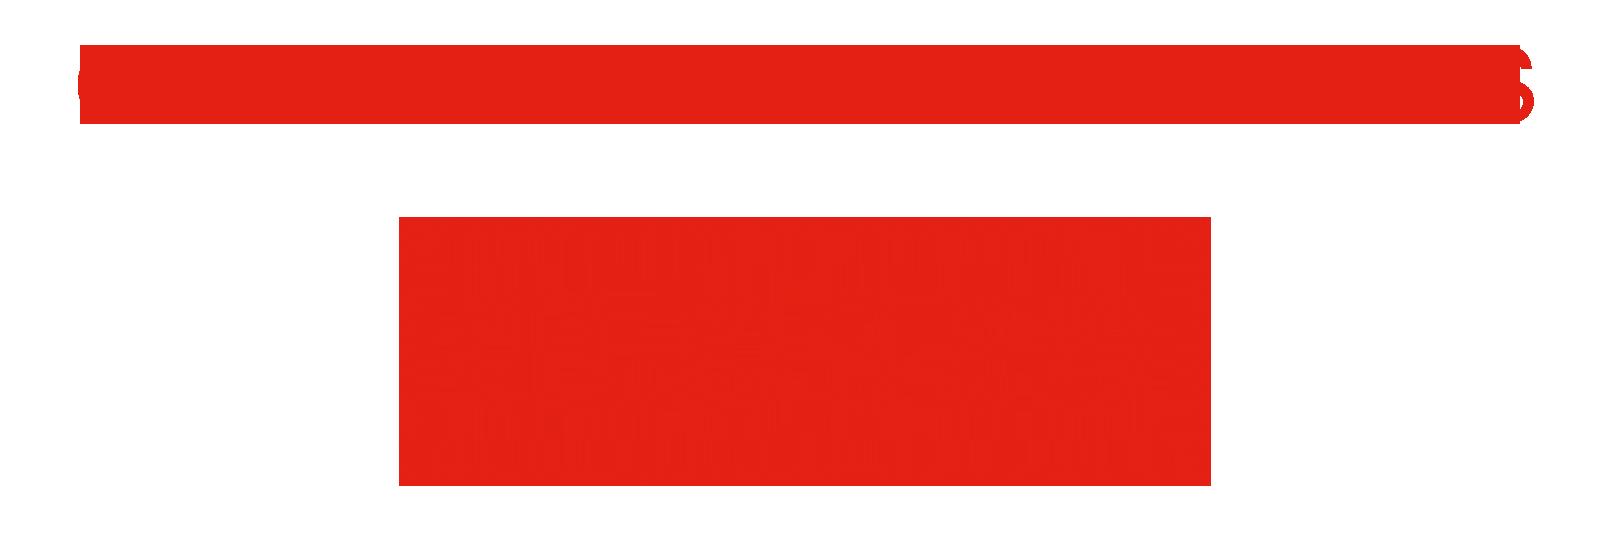 ONUS-PAYPAL CAMPAIGN CLOSED